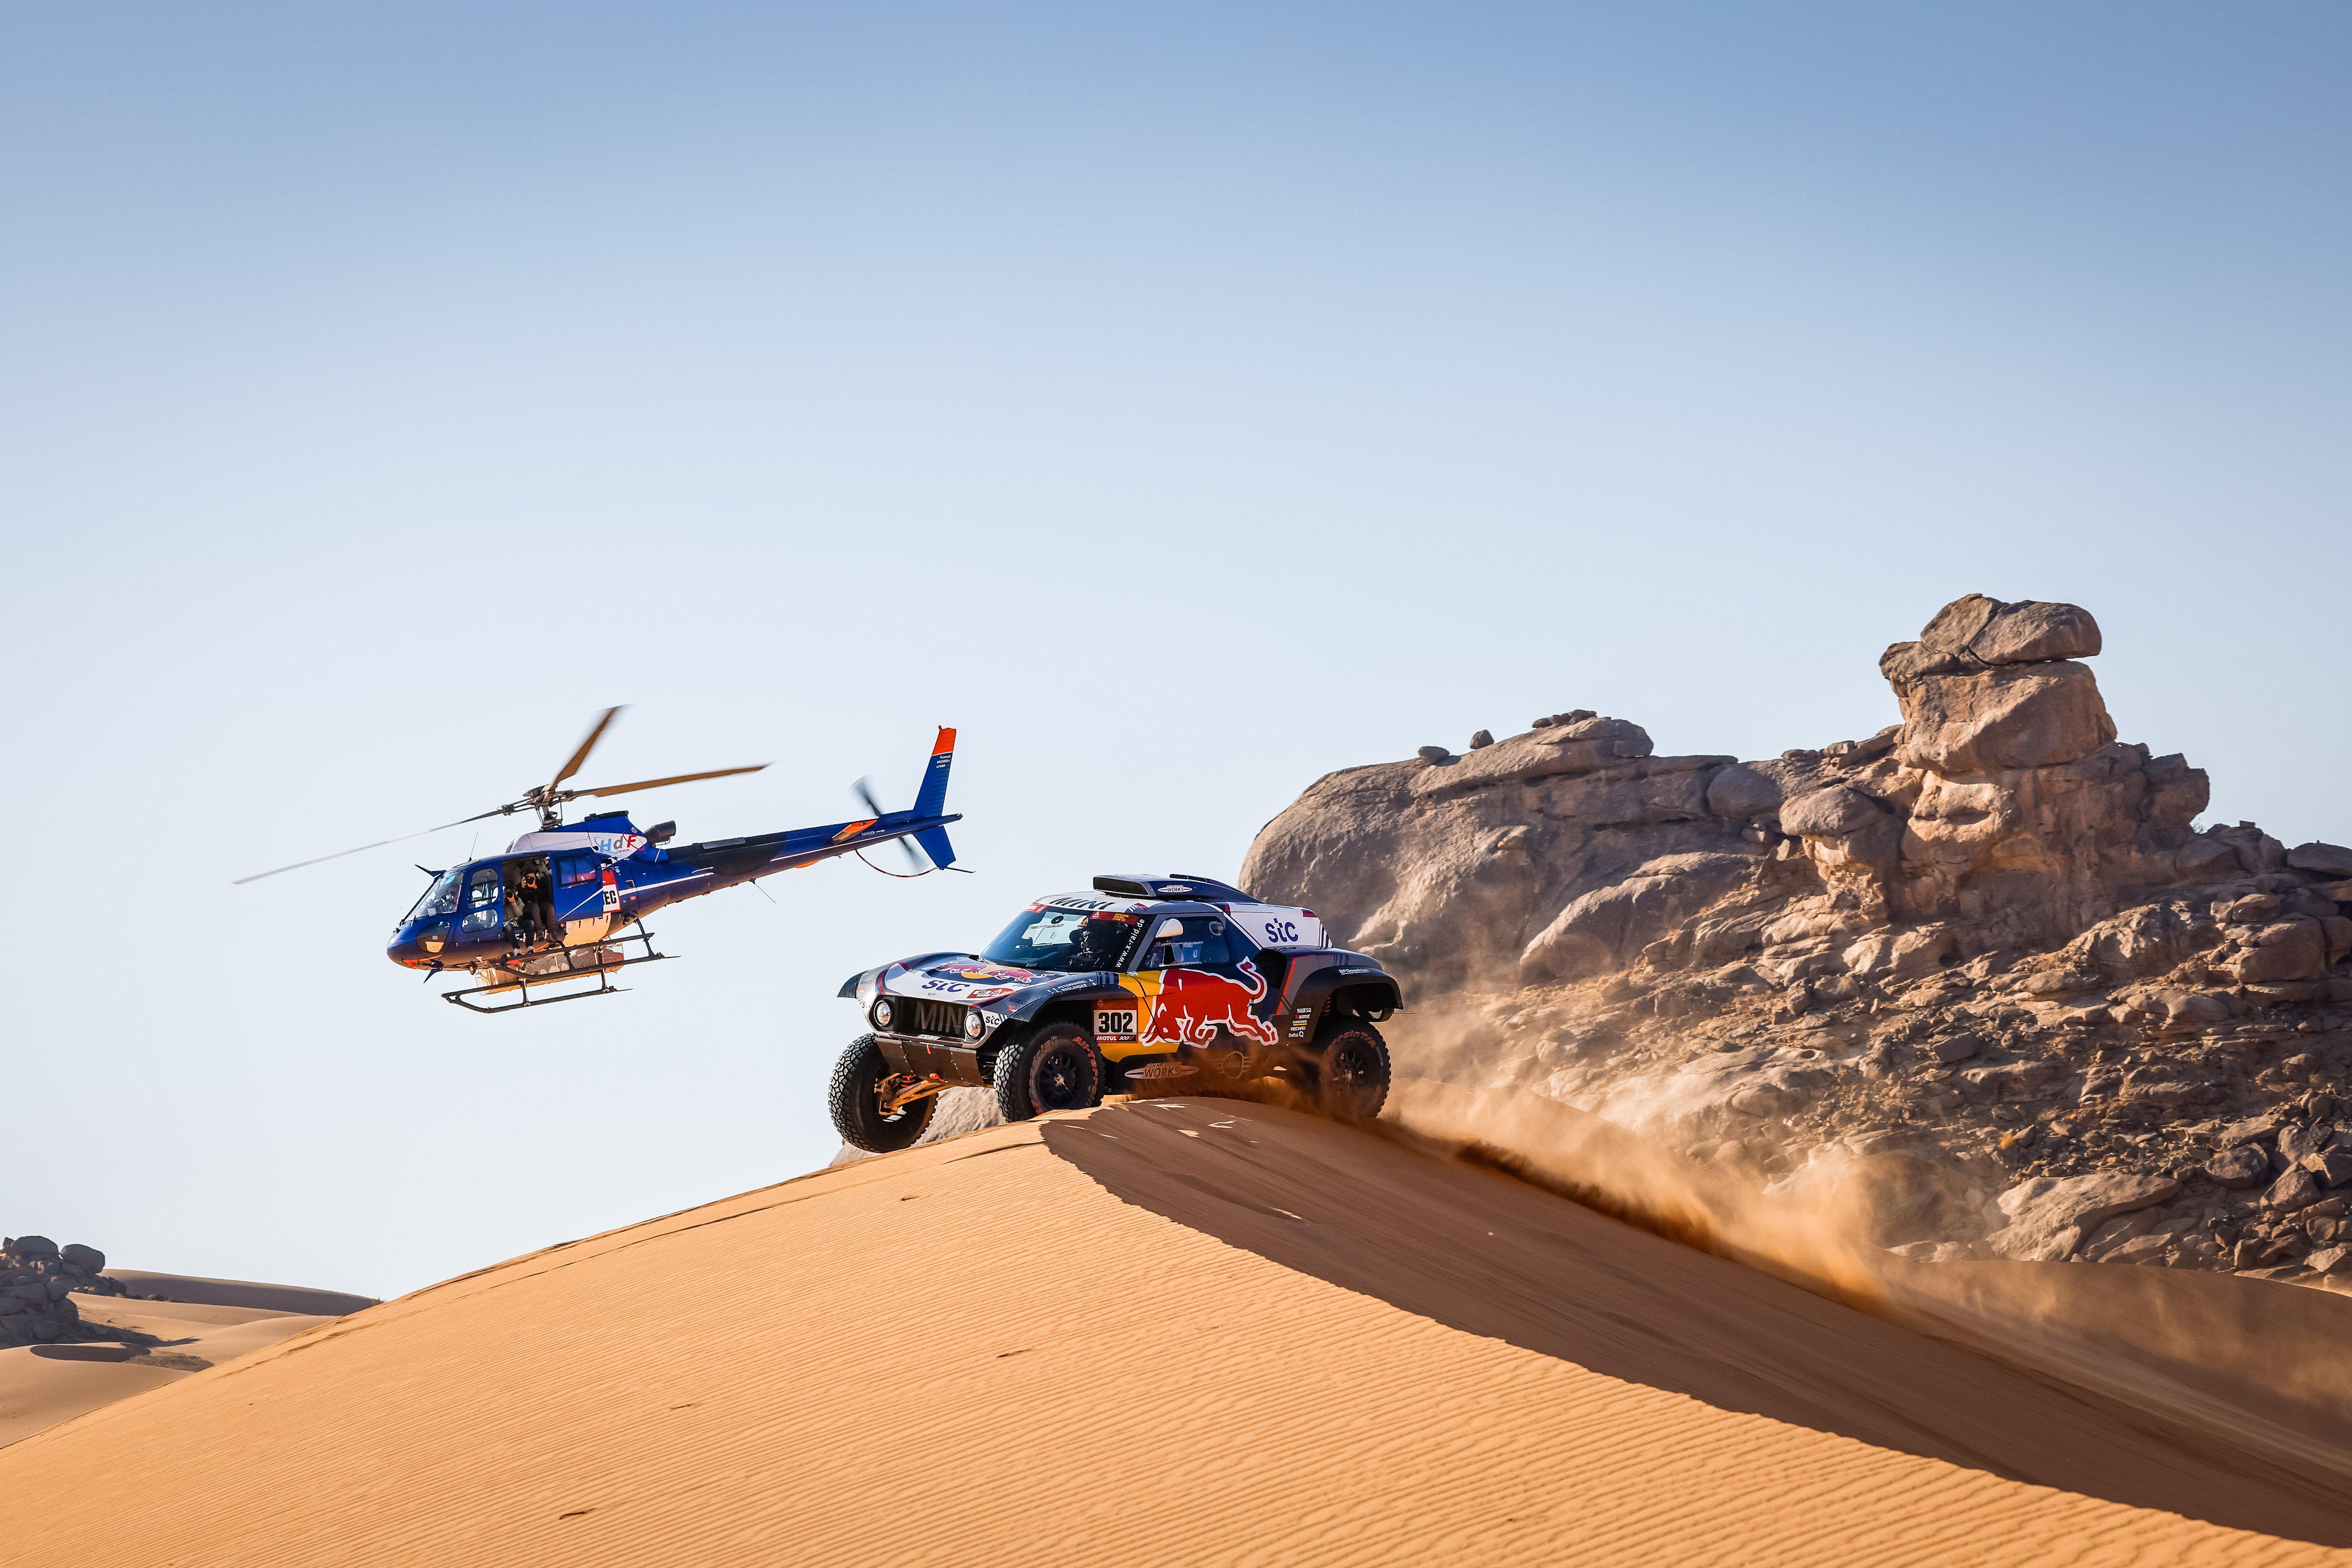 rally-dakar-2021-6eme-victoire-au-general-pour-mini-1416-7.jpg